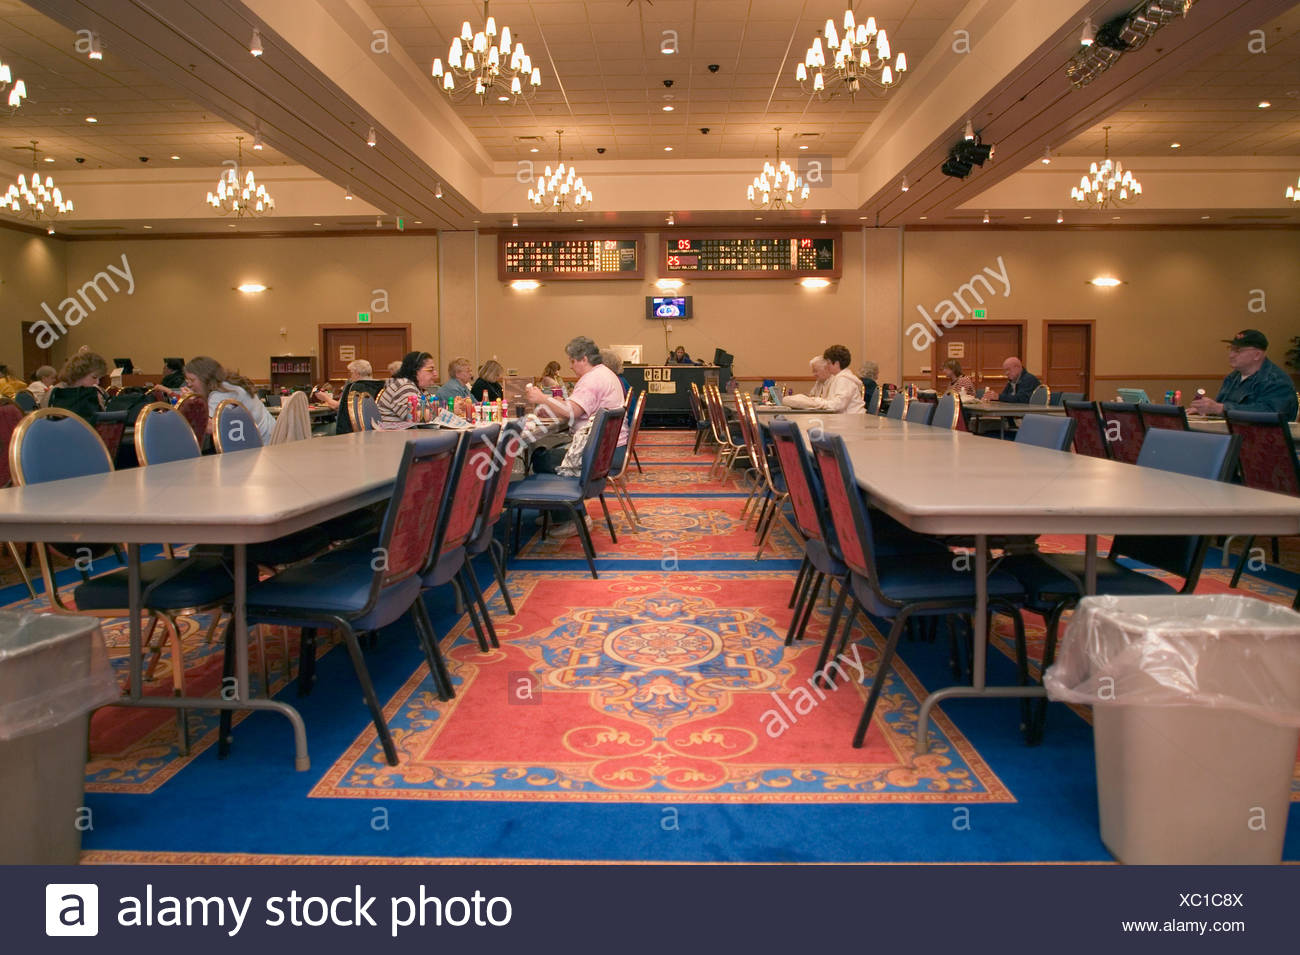 Public dining hall - Stock Image